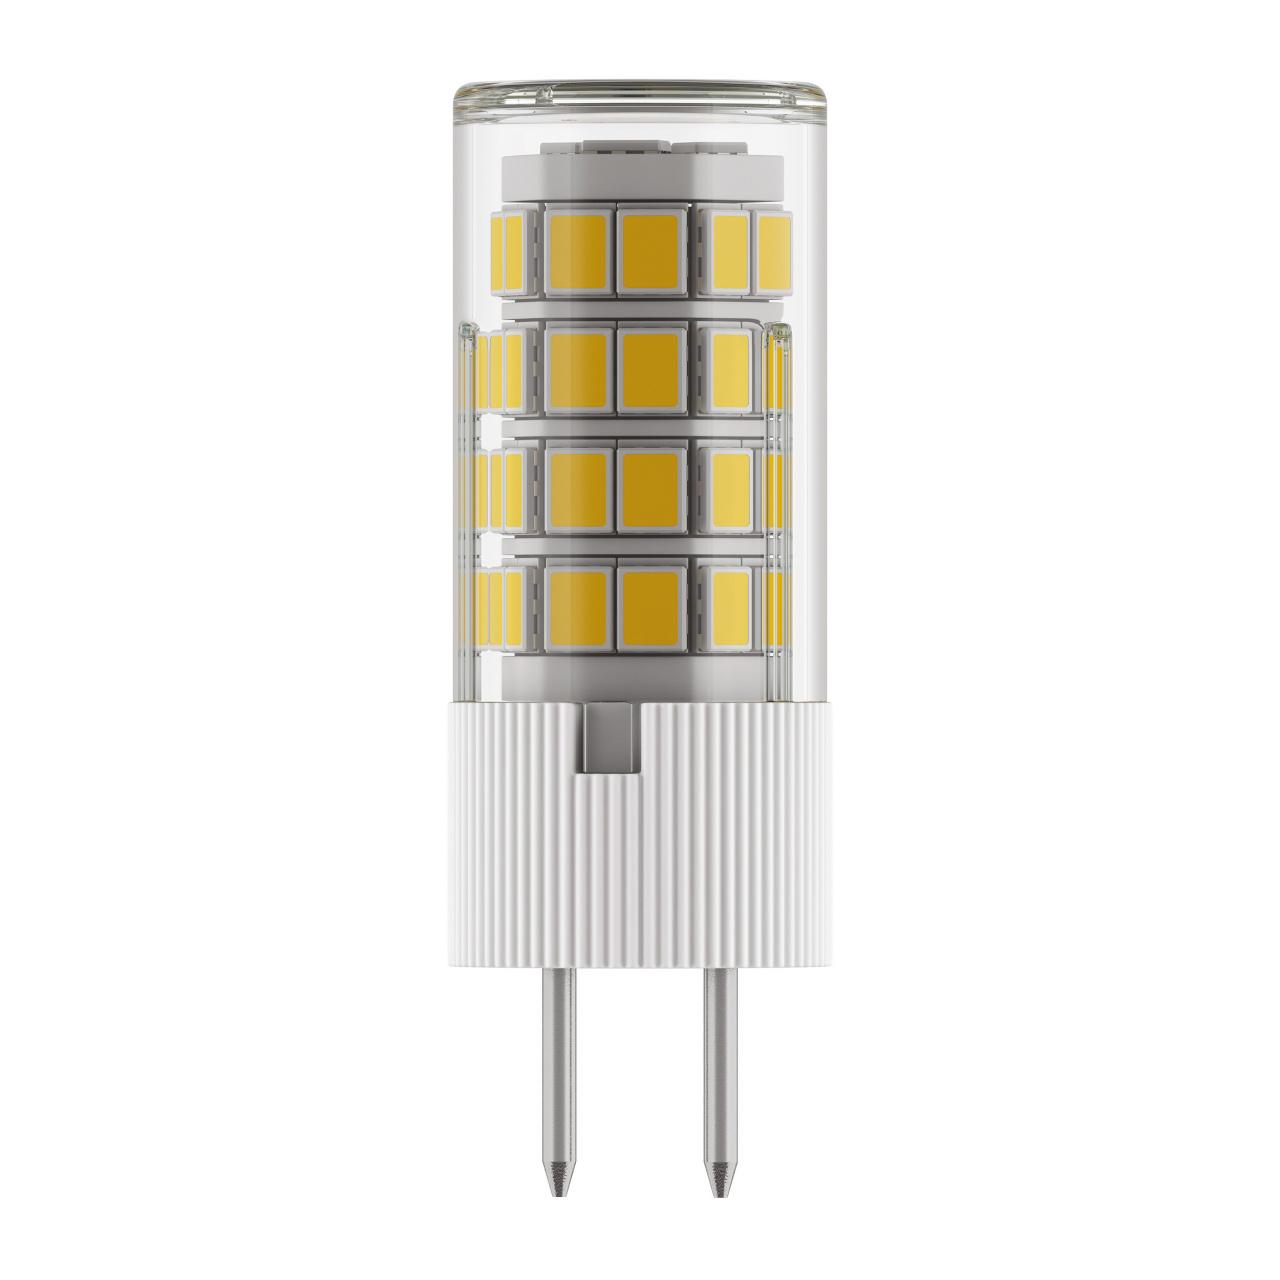 Лампа LED 220V Т20 G5.3 6W=60W 492LM 360G CL 3000K 20000H Lightstar 940432